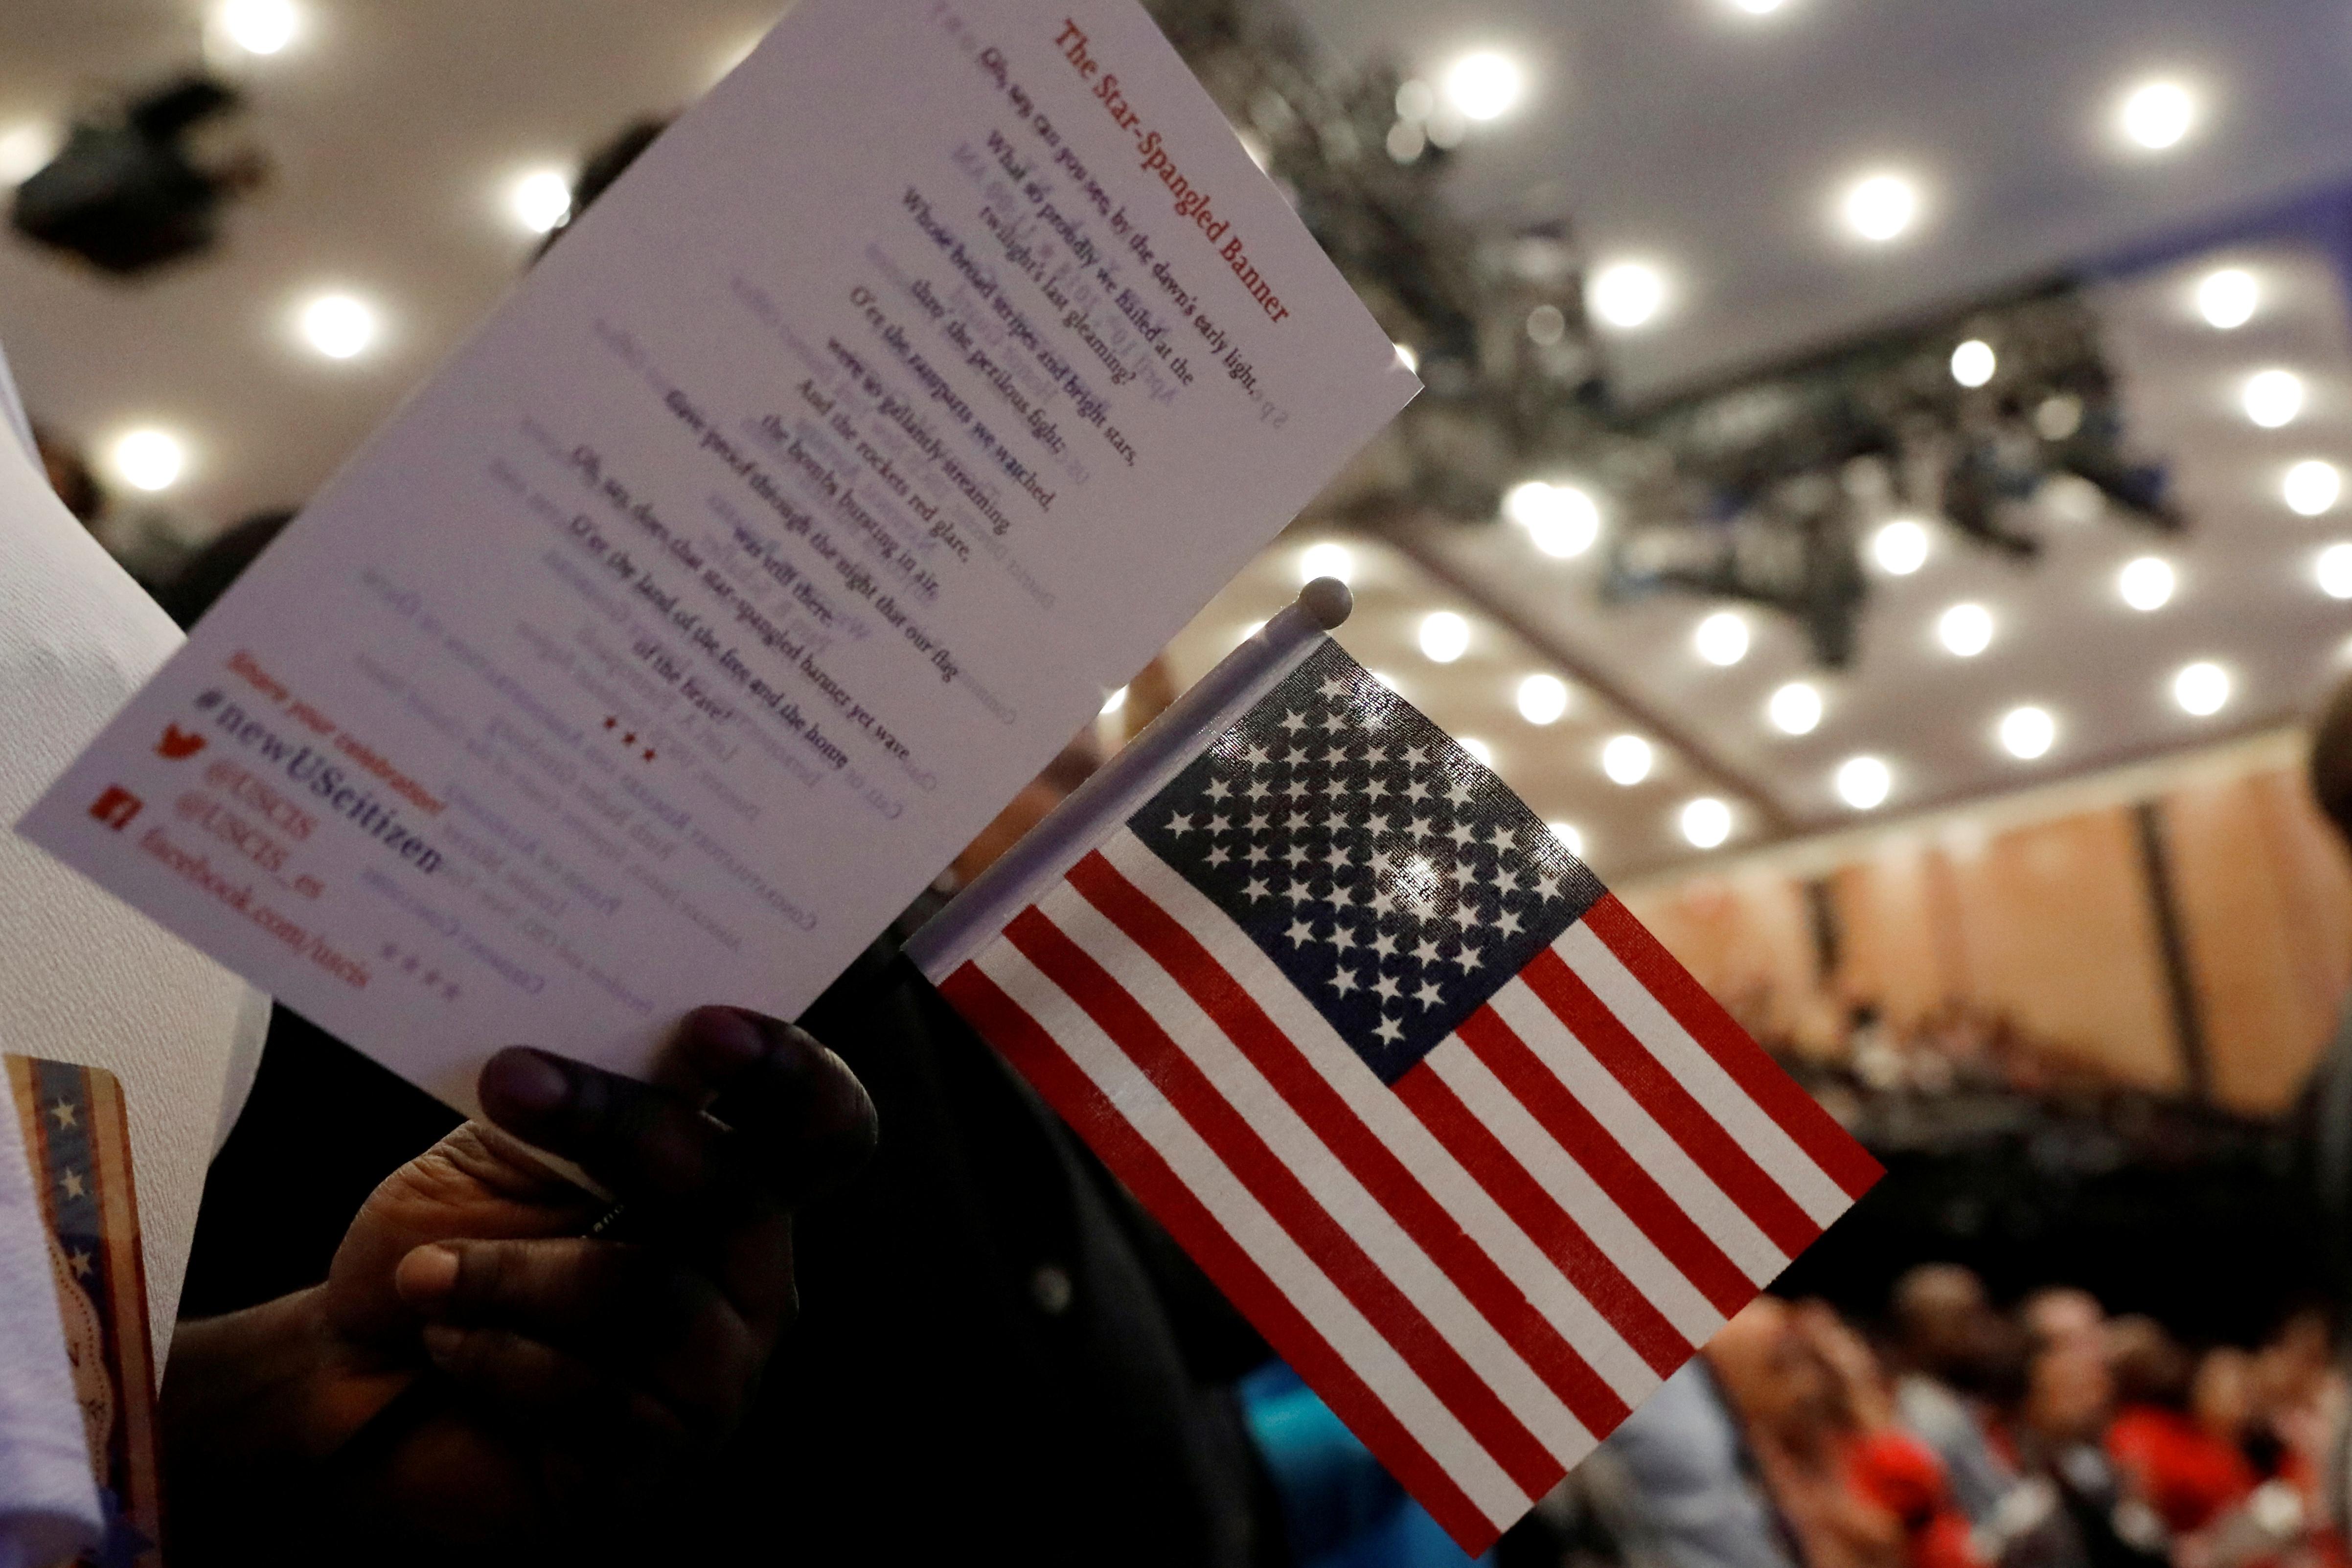 D.C. Circuit: no court review when USCIS revokes visa approval